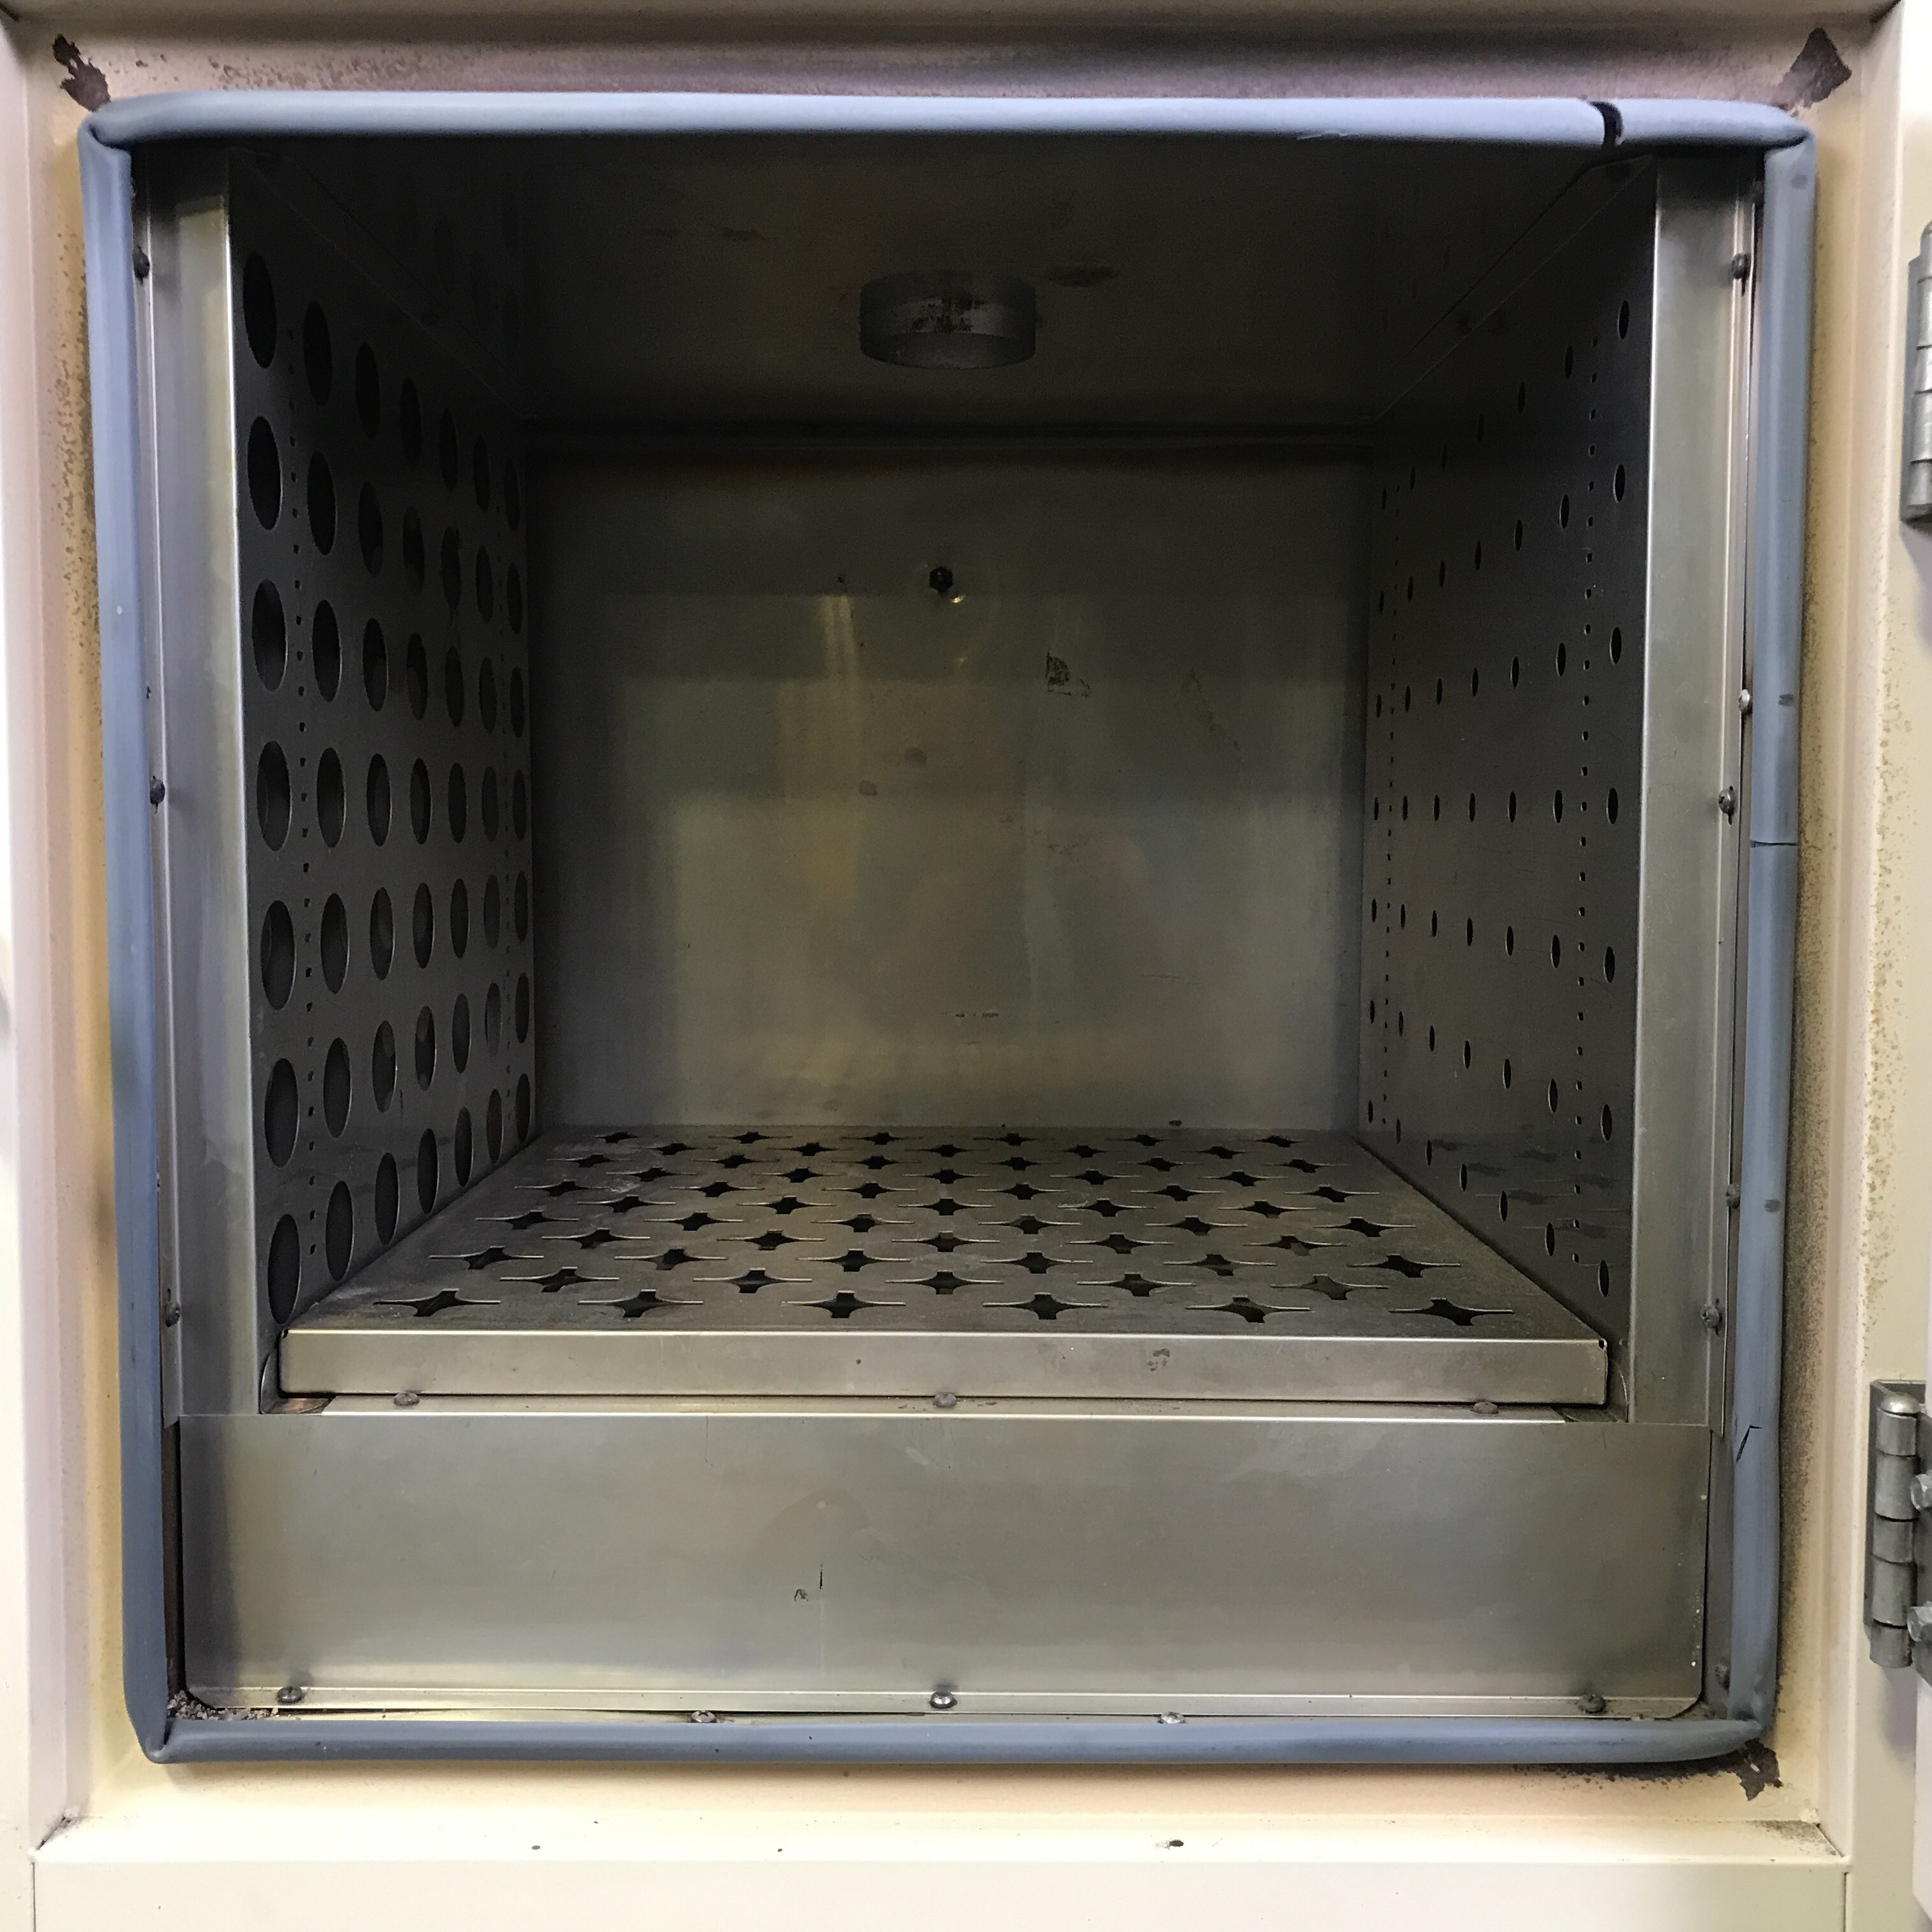 VWR 1350FD Oven Image